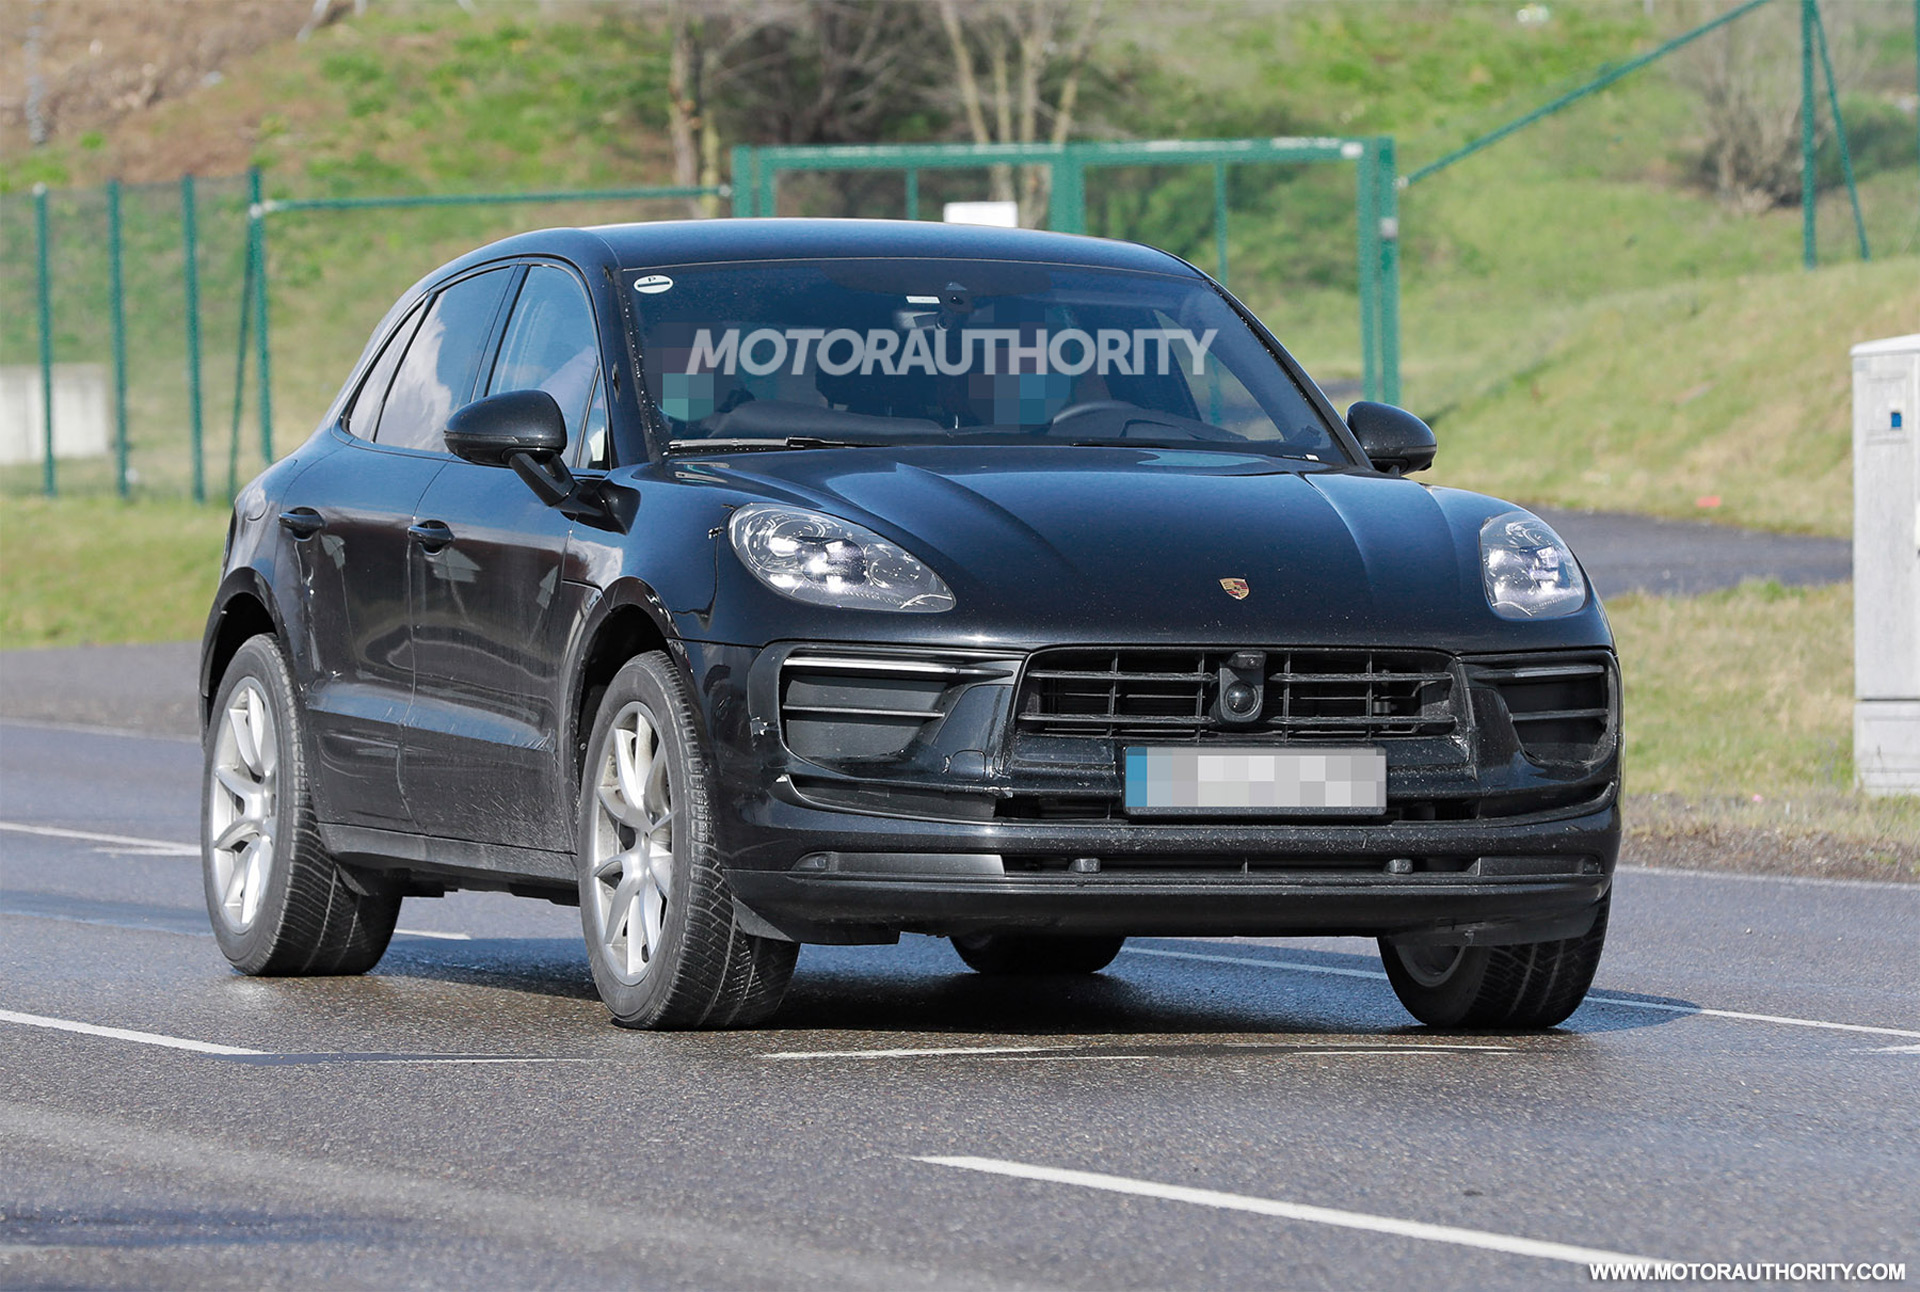 2022 Porsche Macan spy shots: 2nd major update to see EV join range